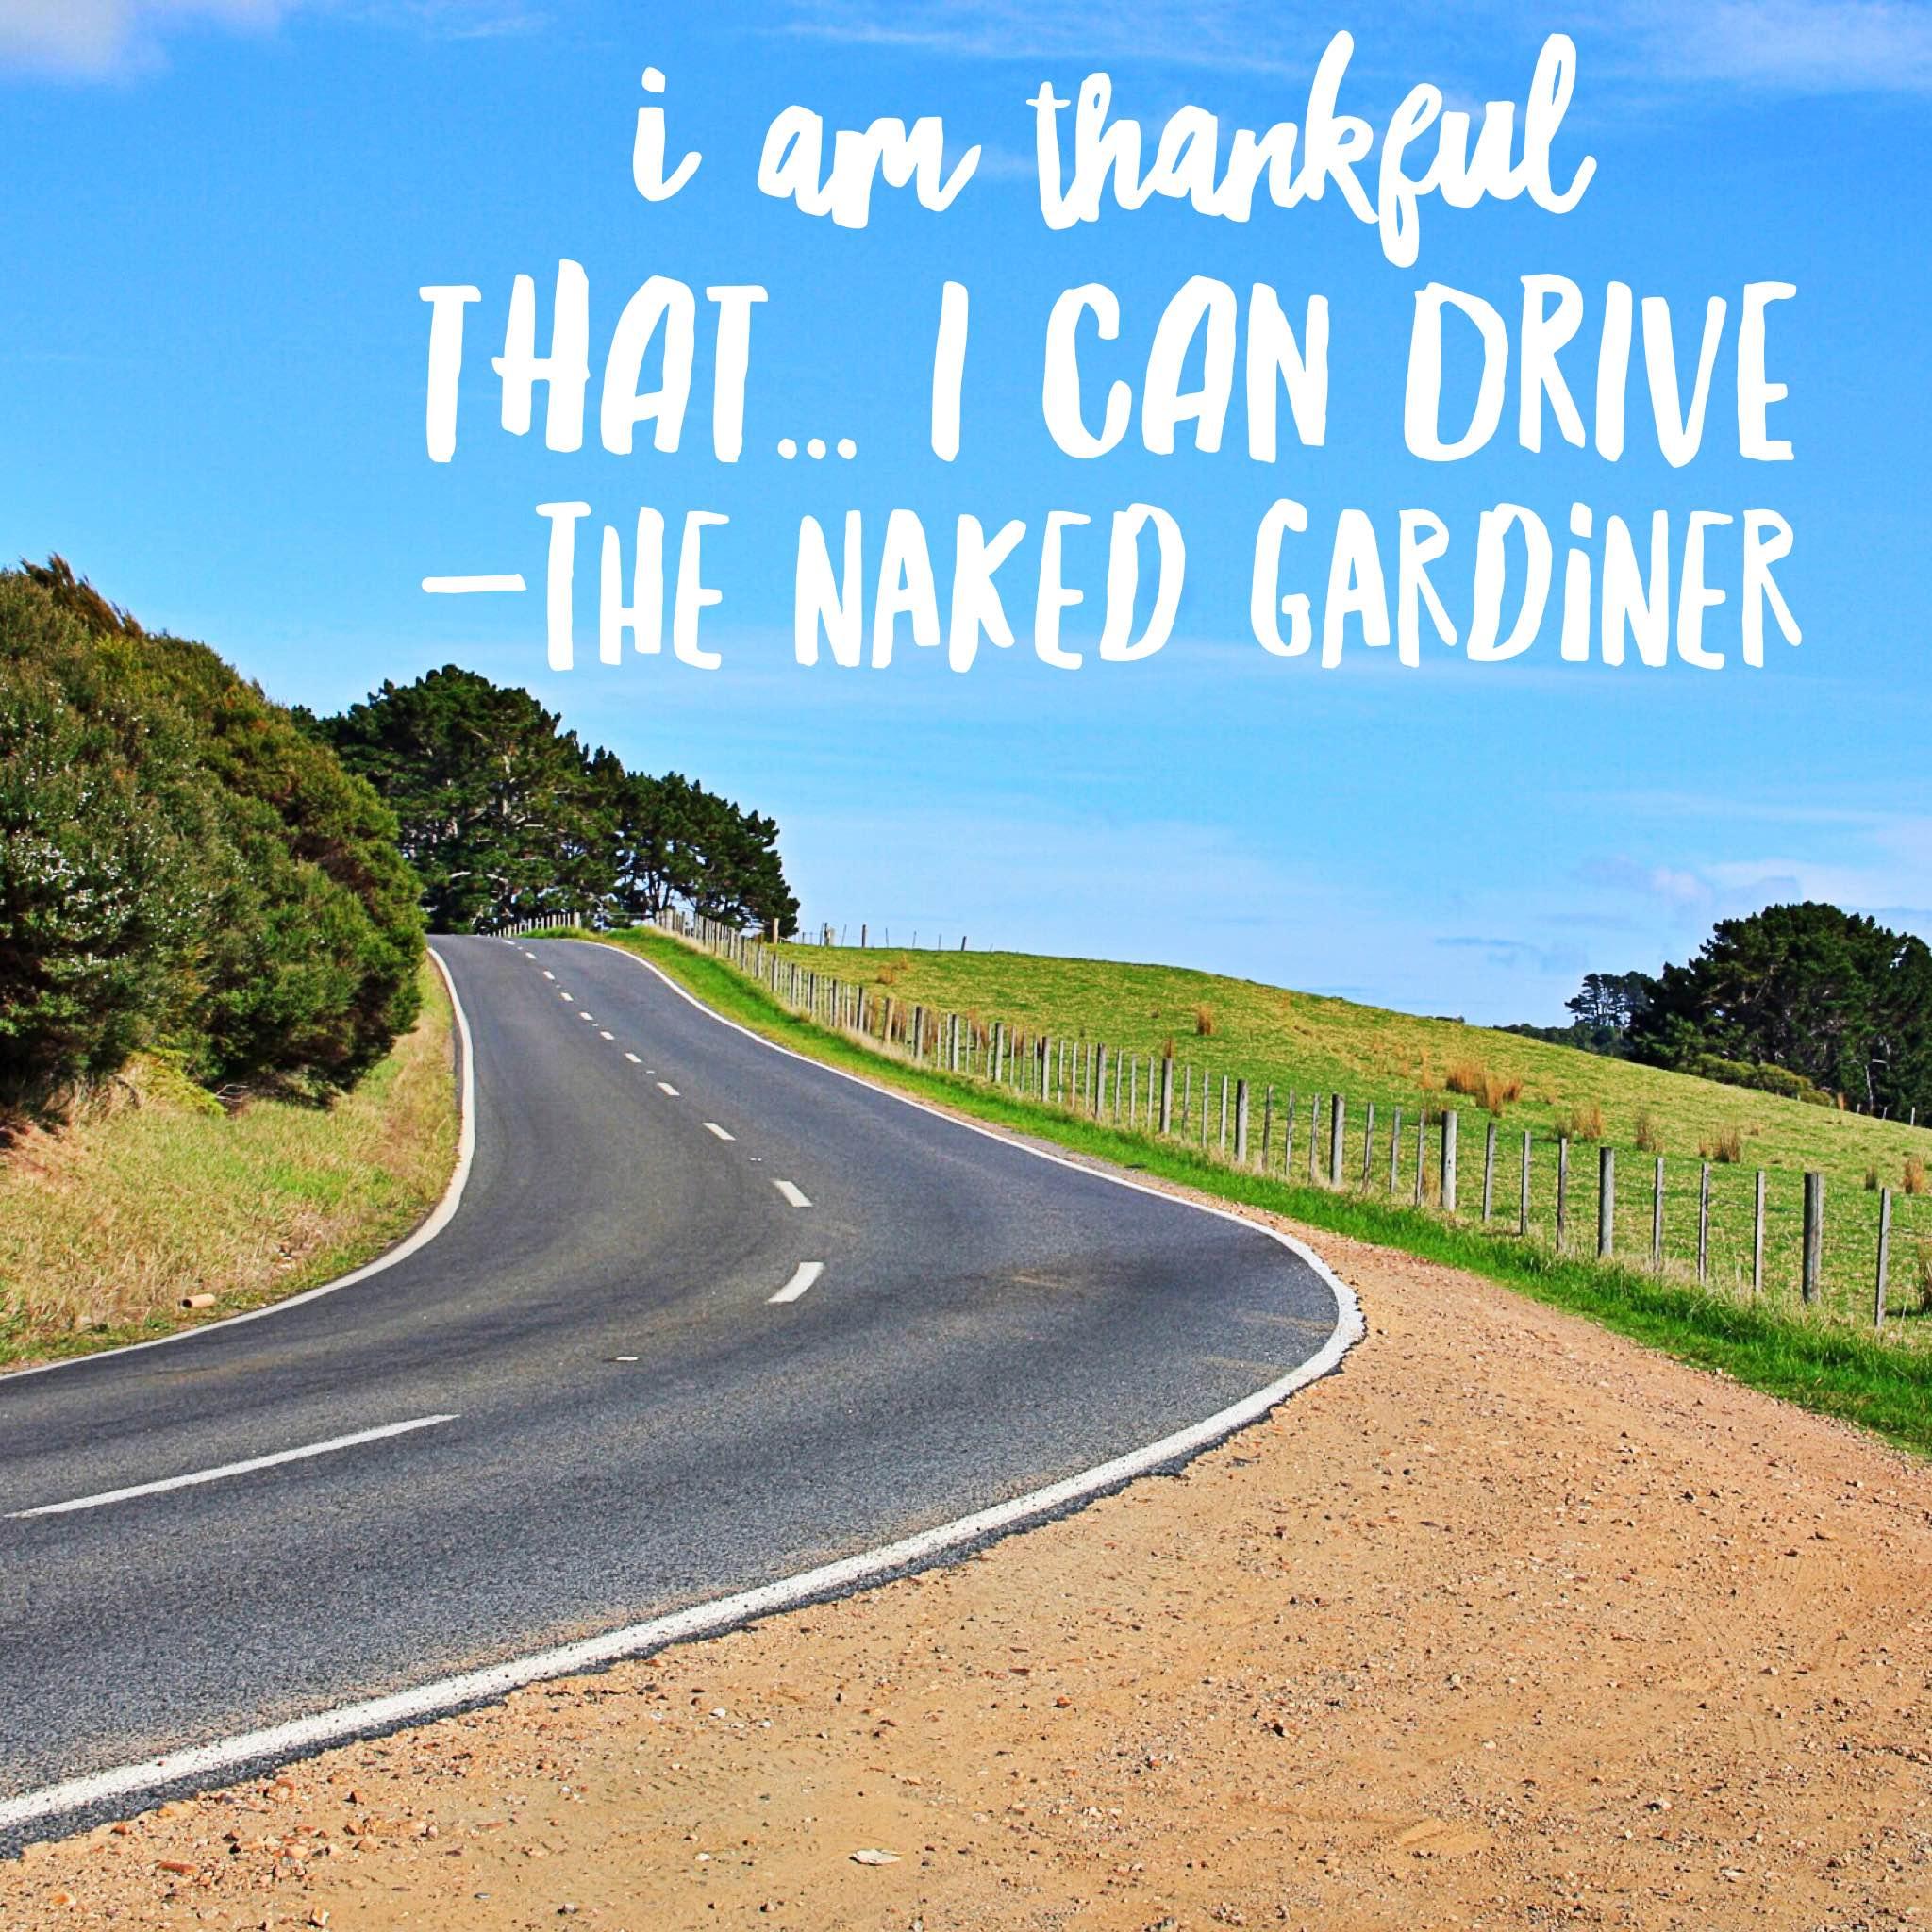 thankful-thursdays-i-can-drive-the-naked-gardiner